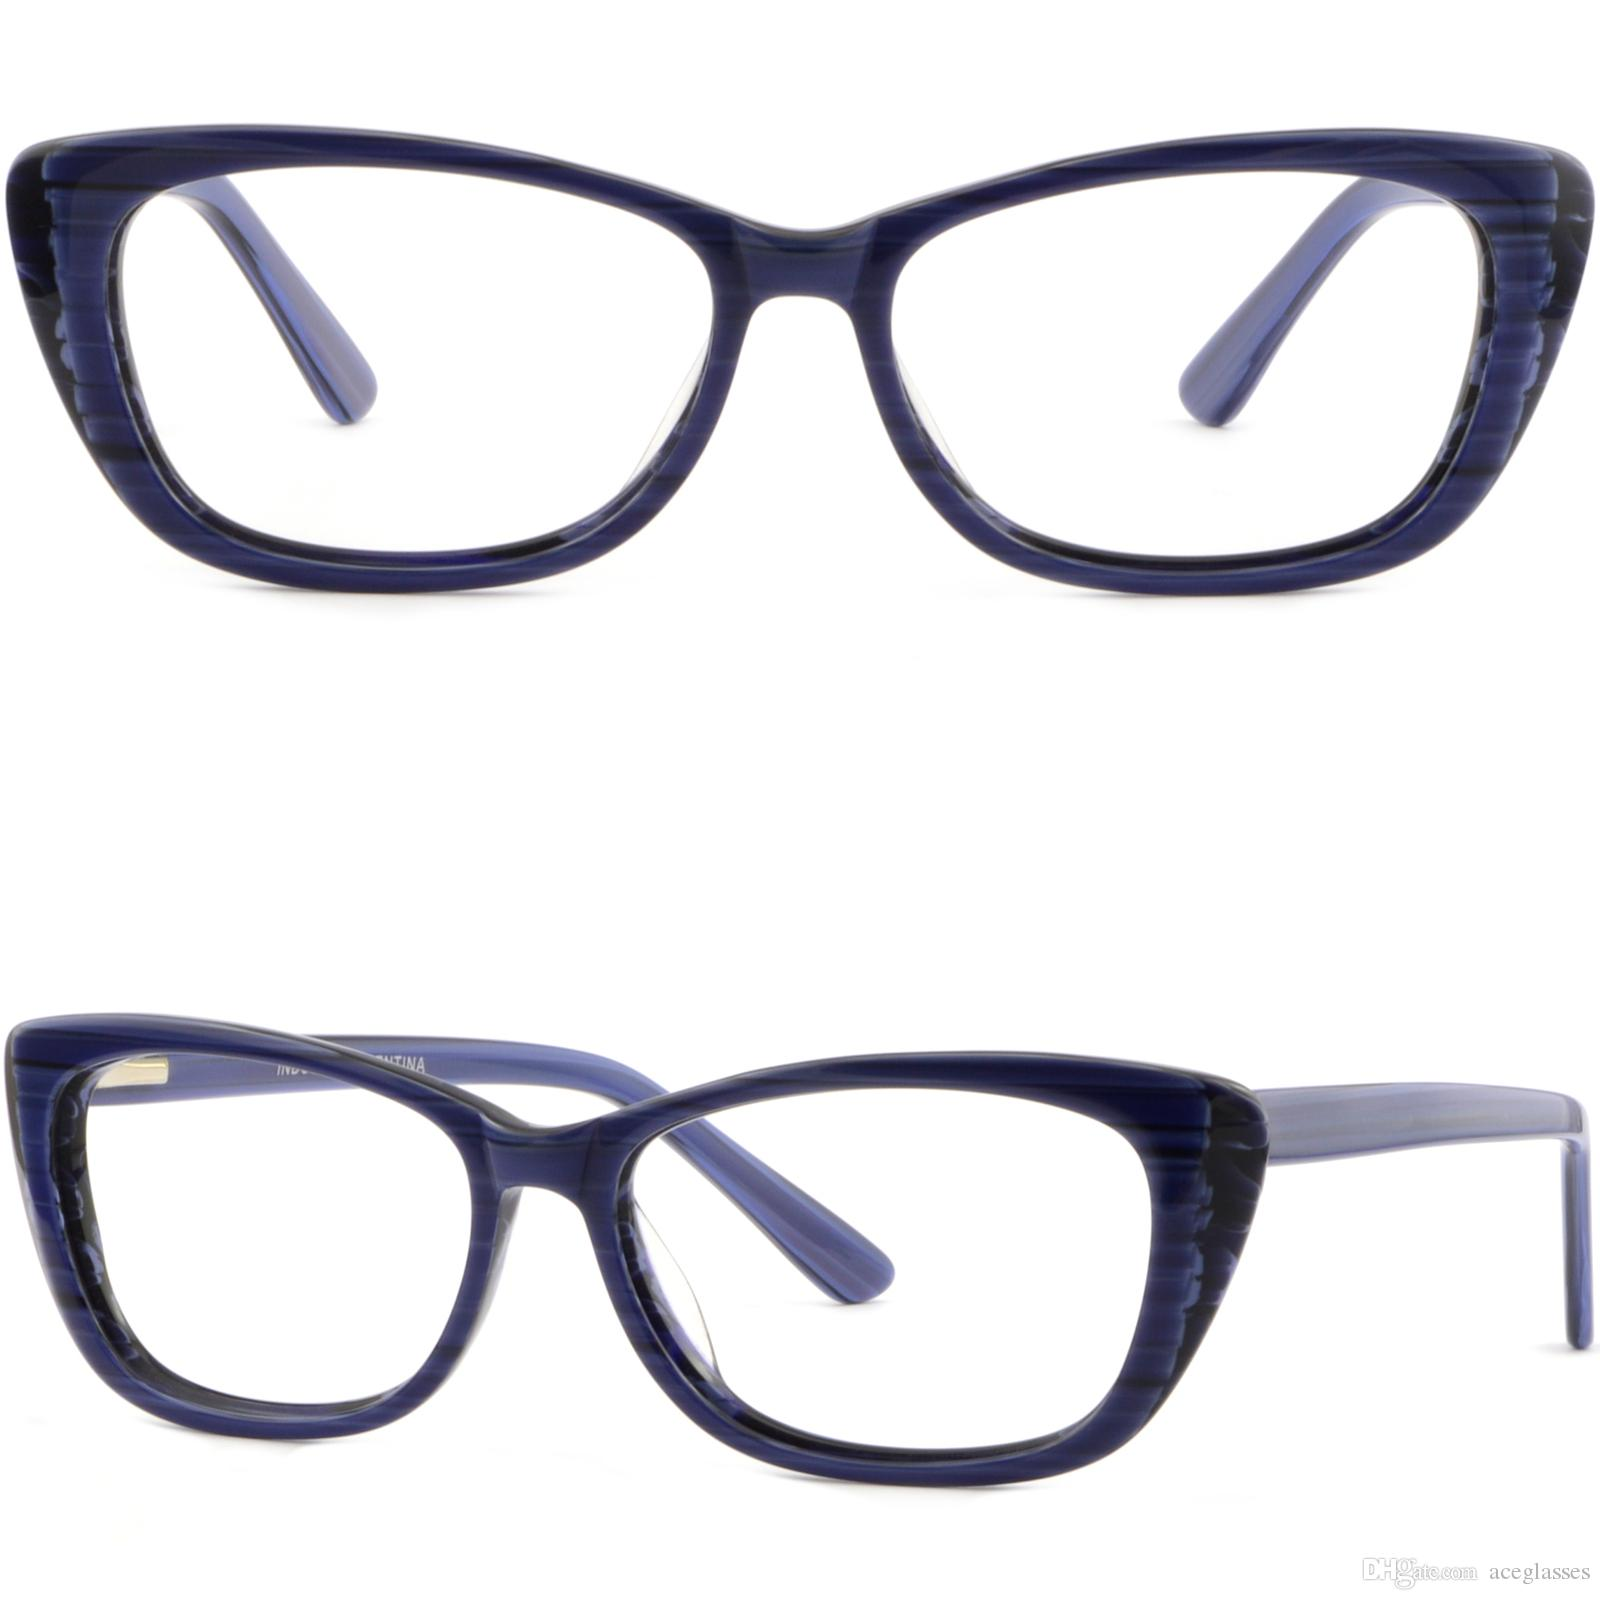 2c270d30a9b Women s Cat-eye Plastic Frame Cateye Prescription Glasses Spring ...